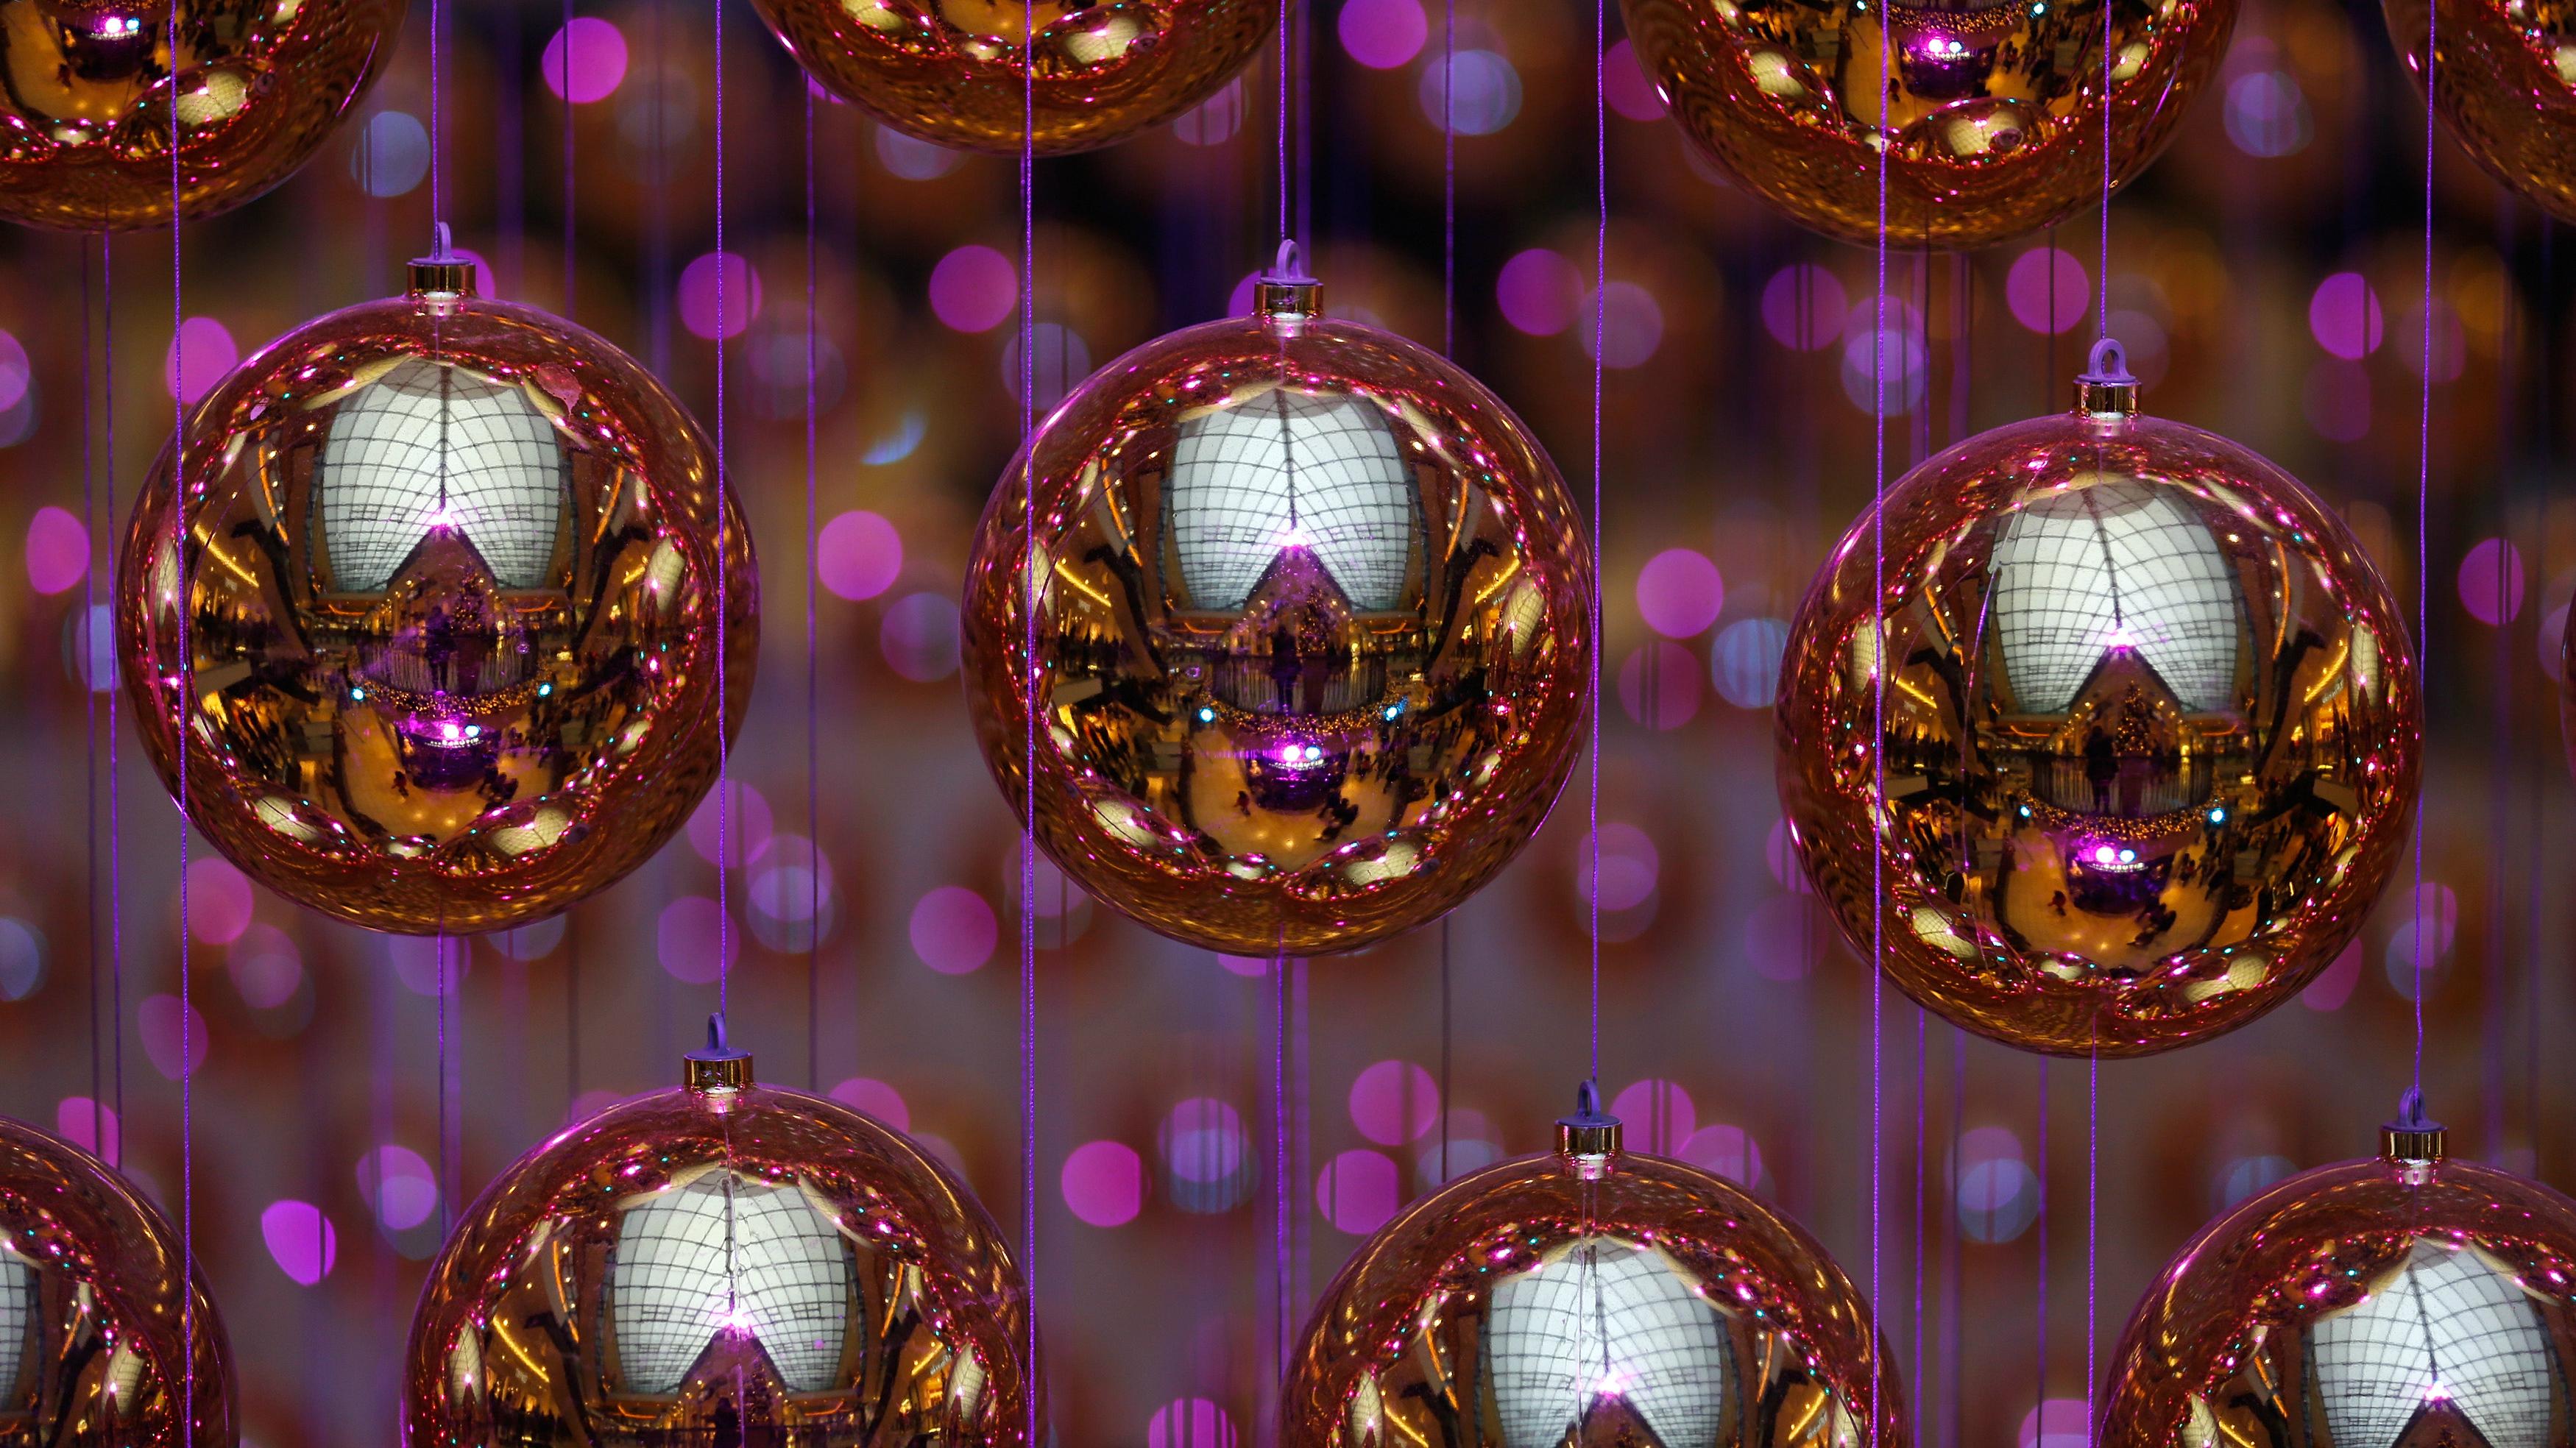 Shiny Christmas ornaments.